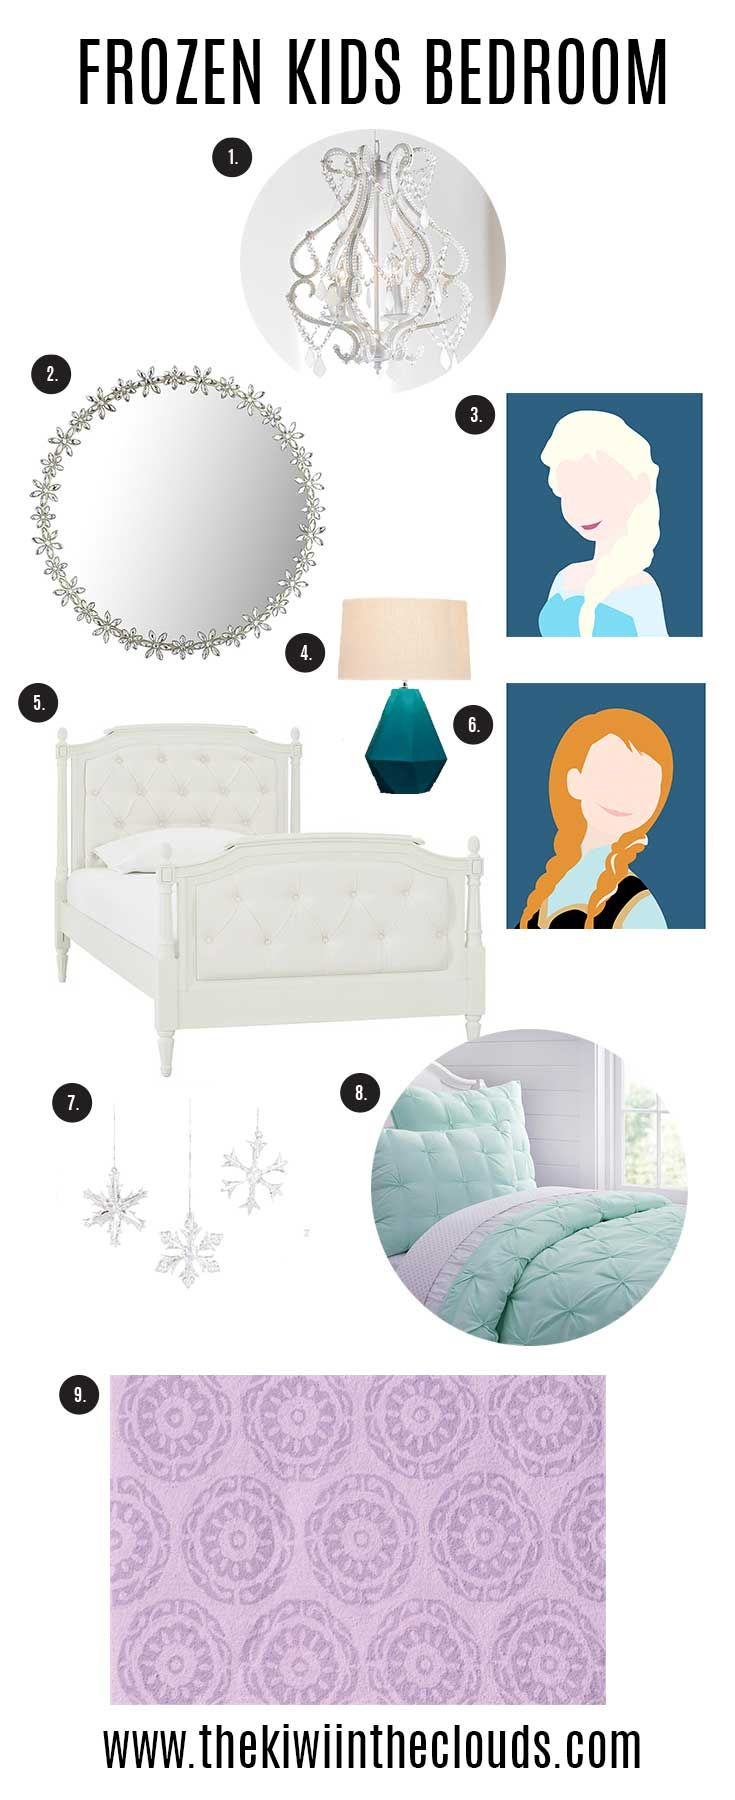 Frozen inspired bedroom - Frozen Inspired Bedroom